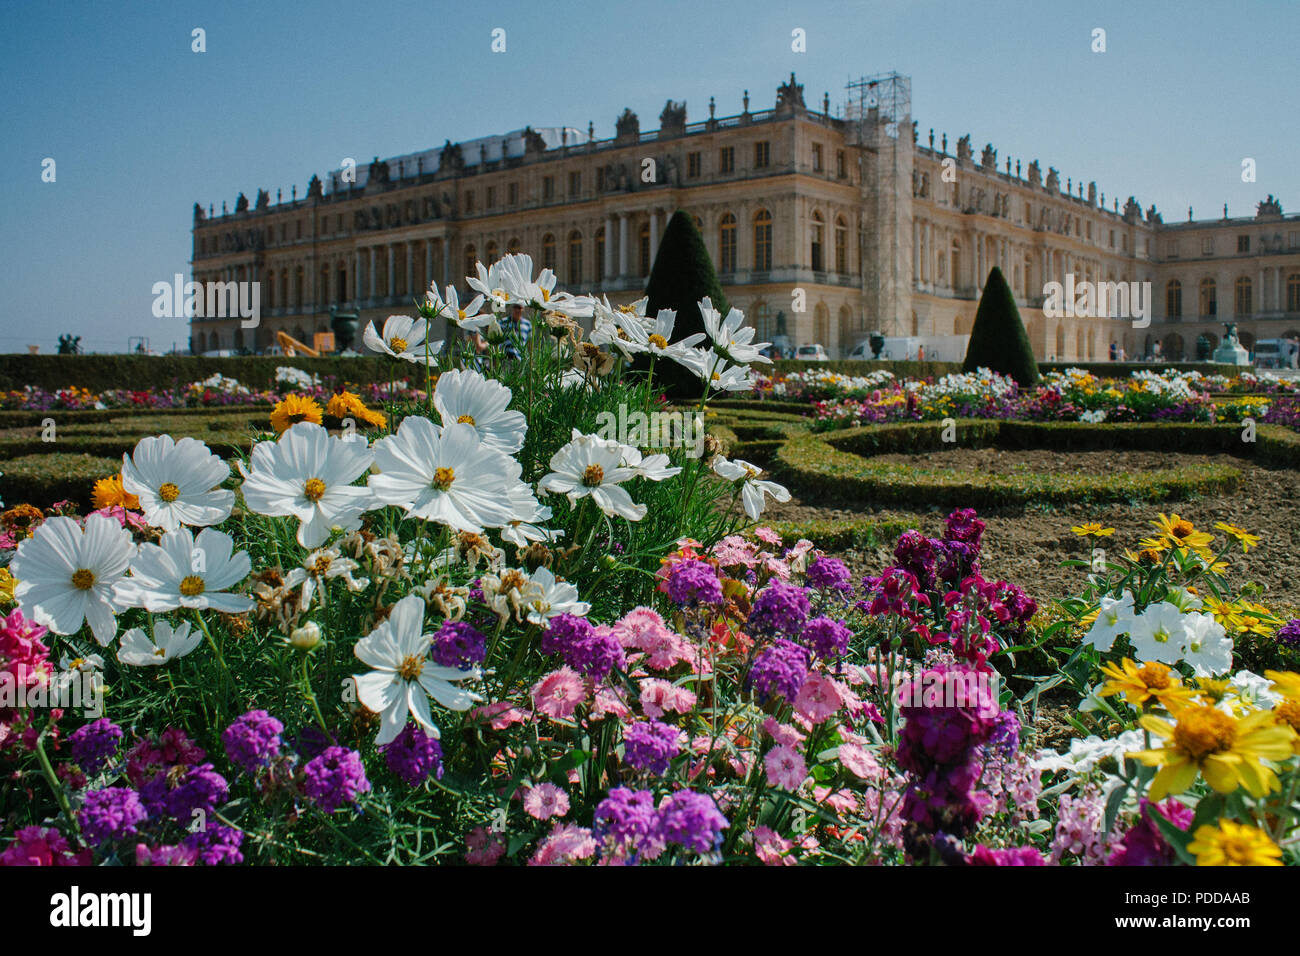 Gardens Of Versailles Flowers 6